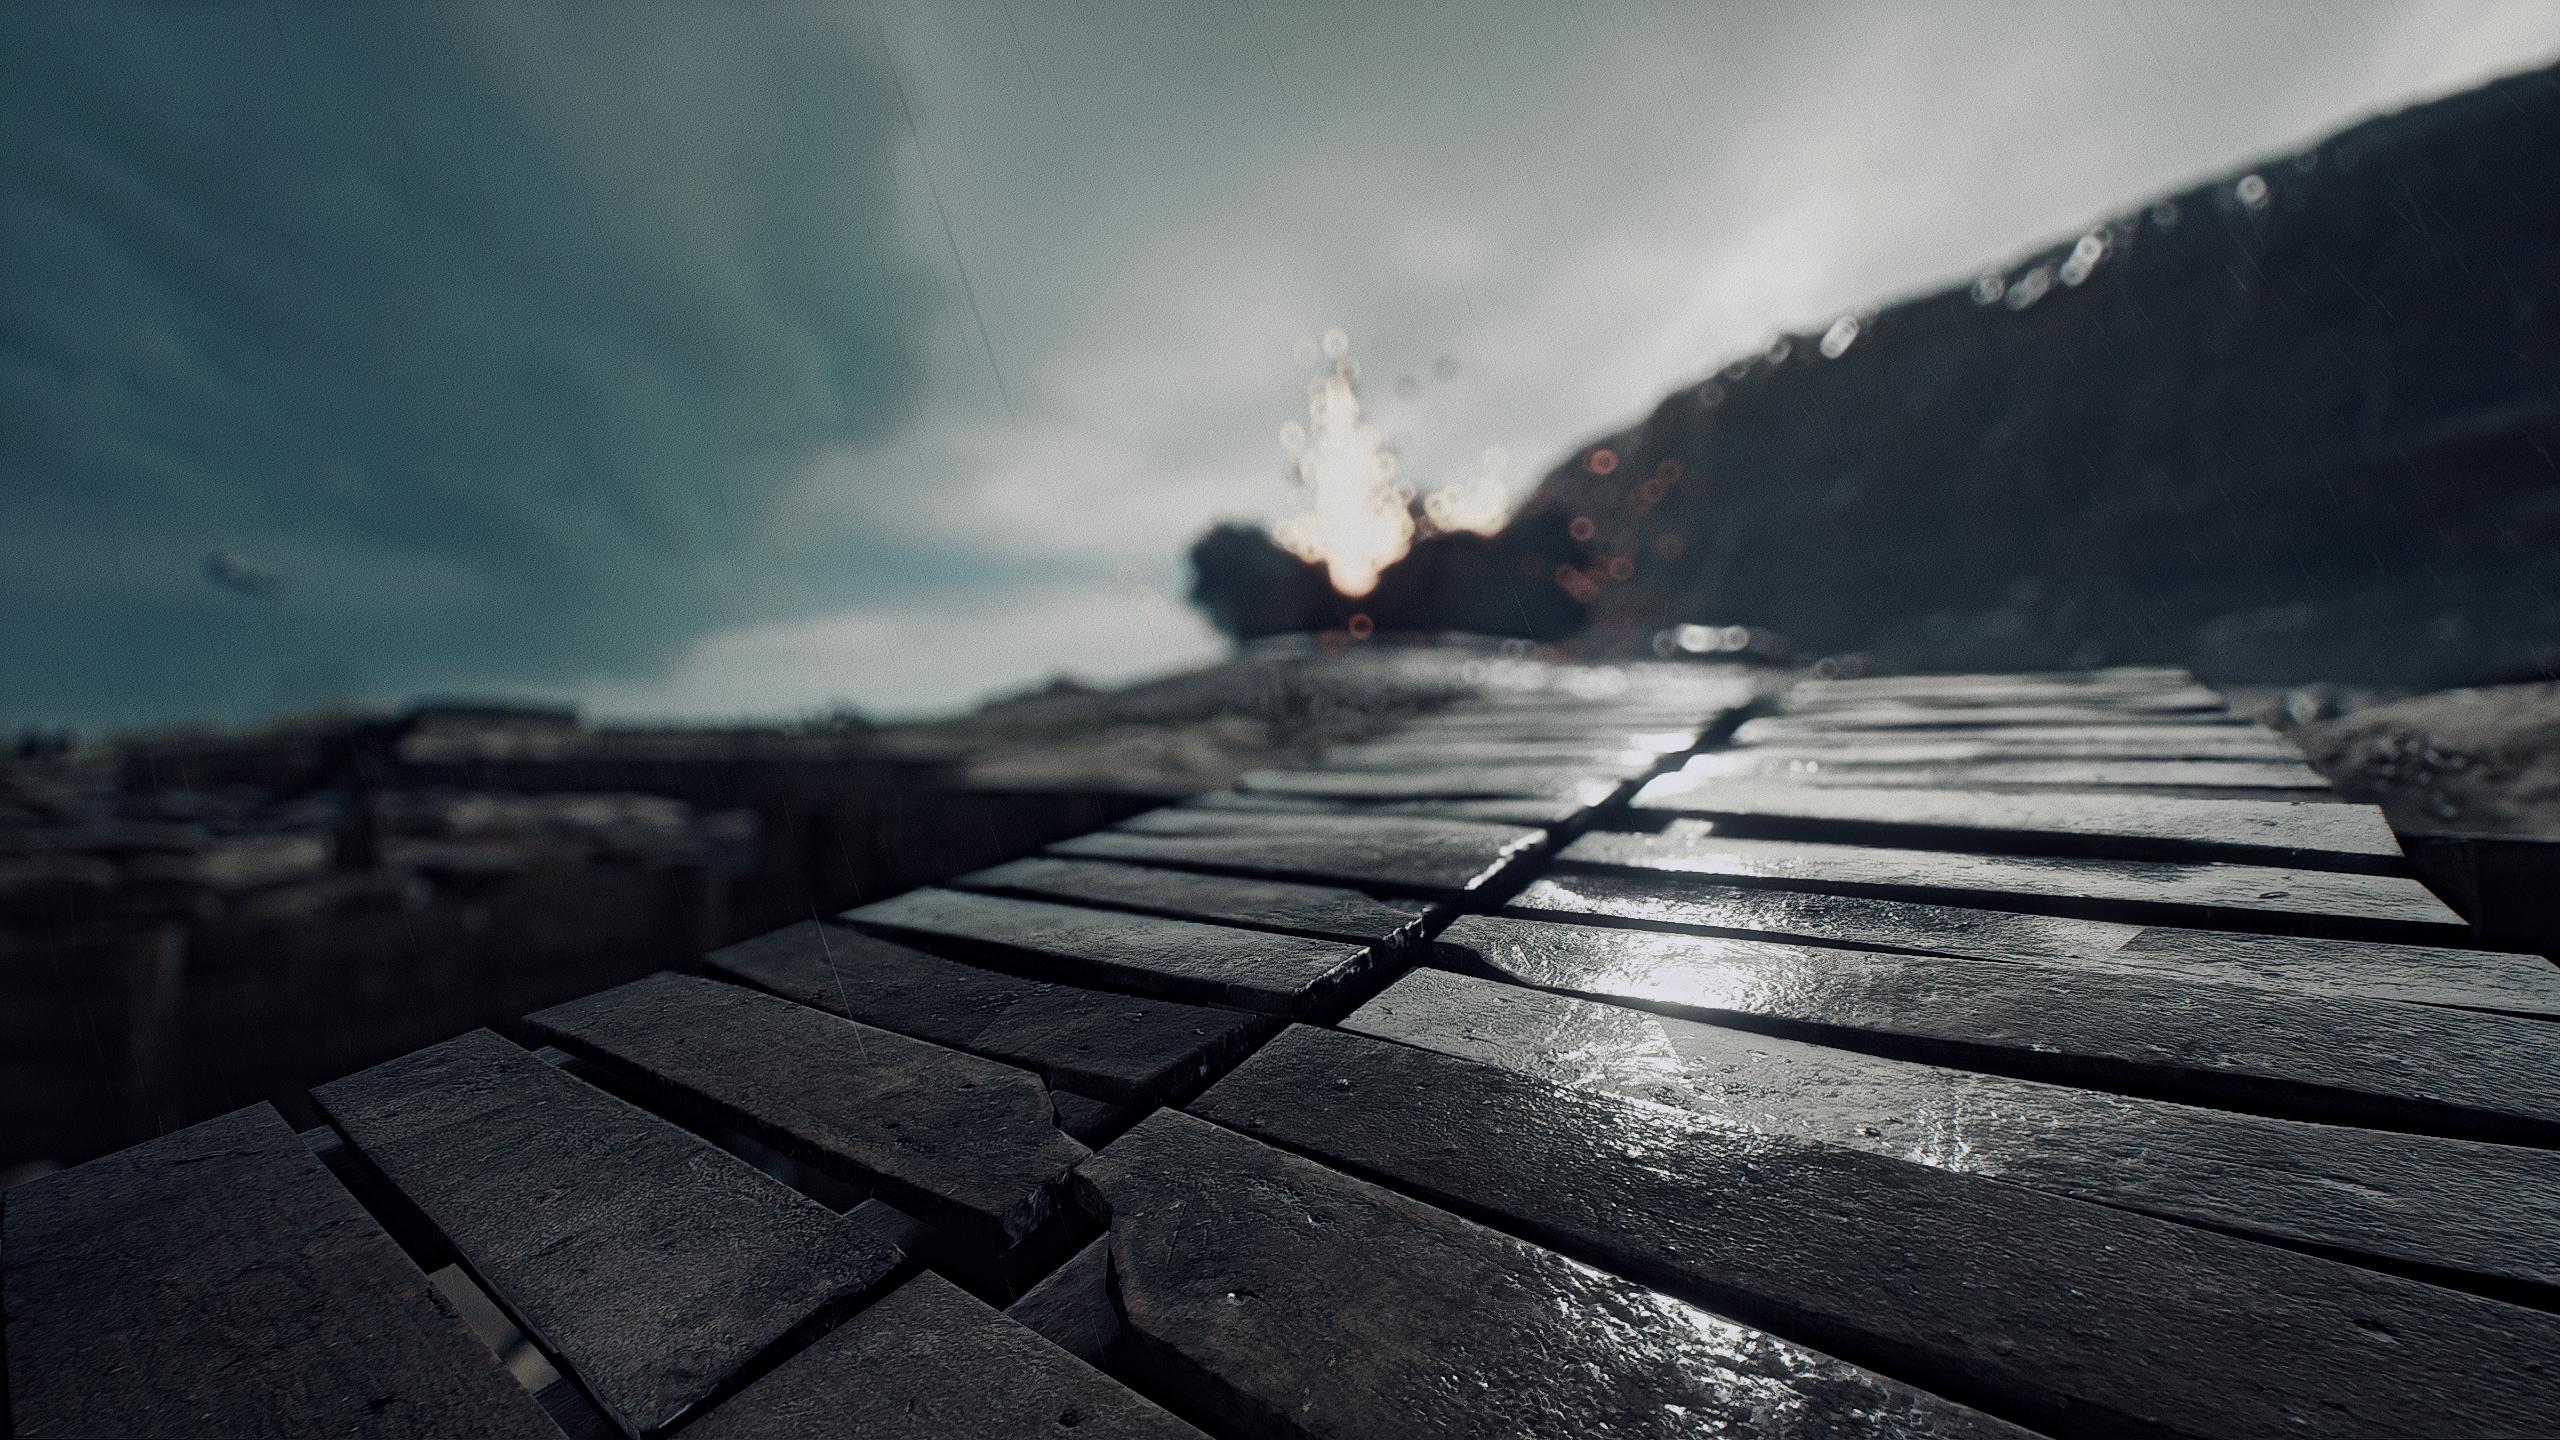 Battlefield 1 HD Wallpaper | Background Image | 2560x1440 | ID:937763 - Wallpaper Abyss